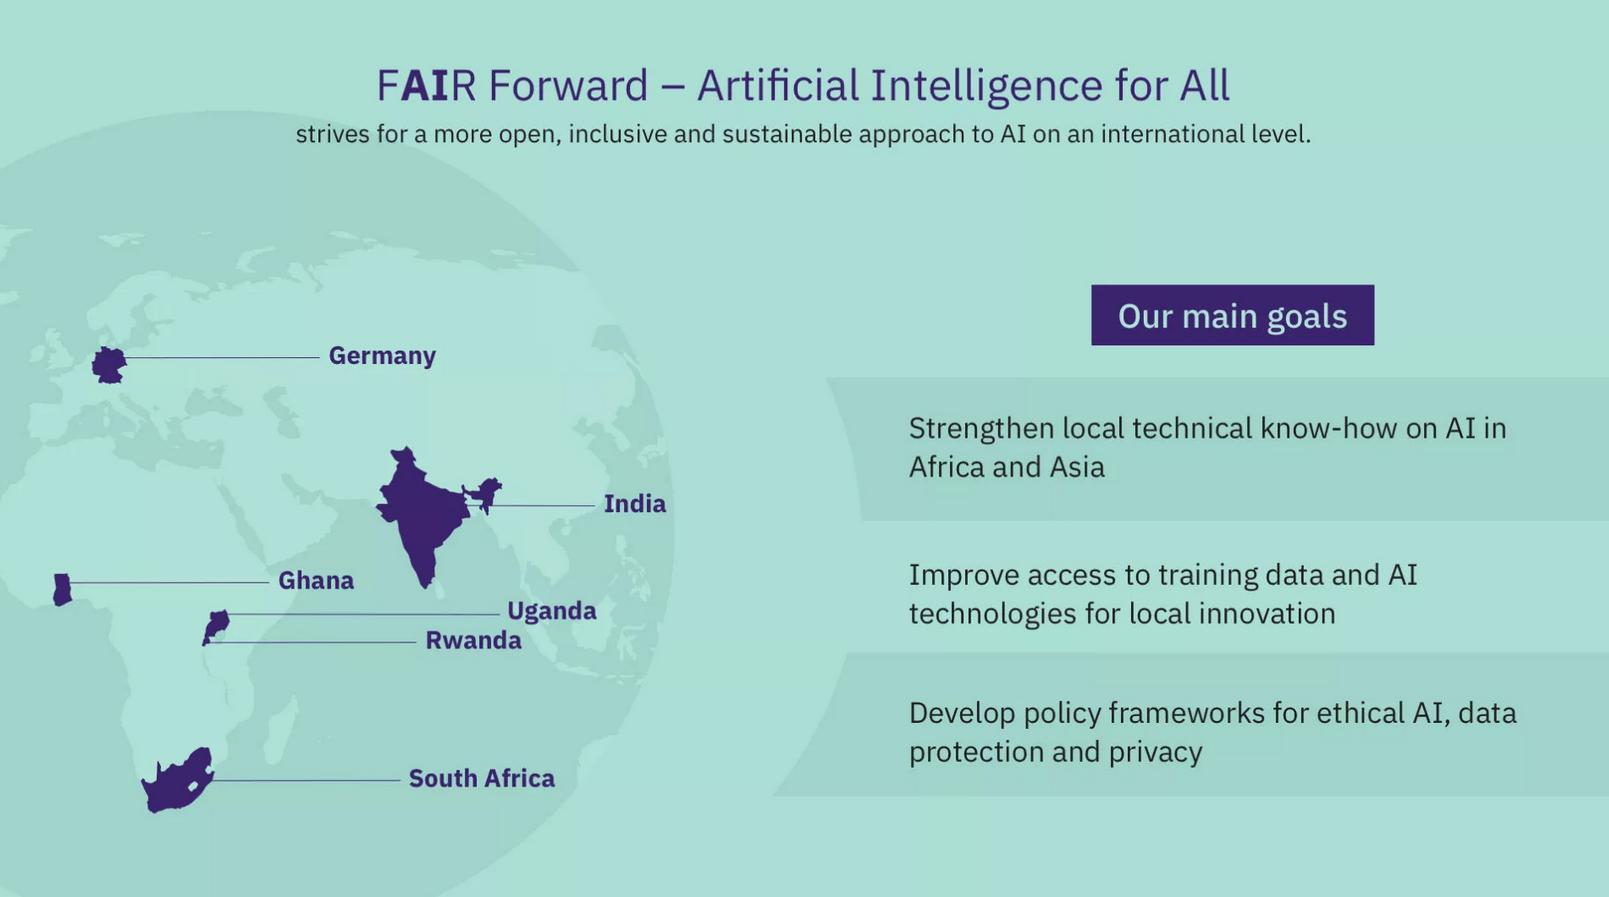 Fair Forward - Artificial Intelligence for all